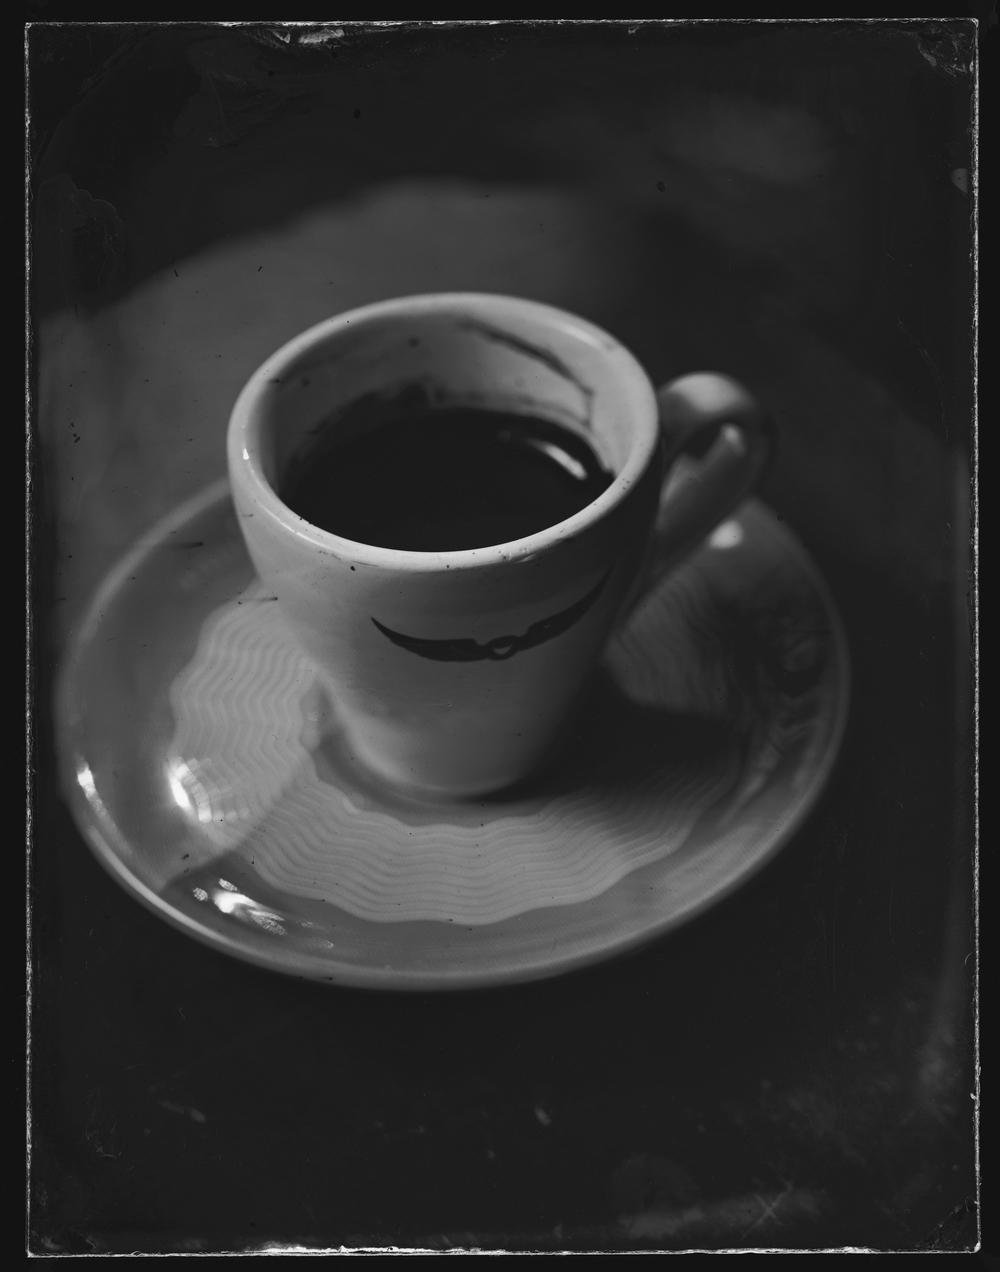 A Espresso cup-2.jpg